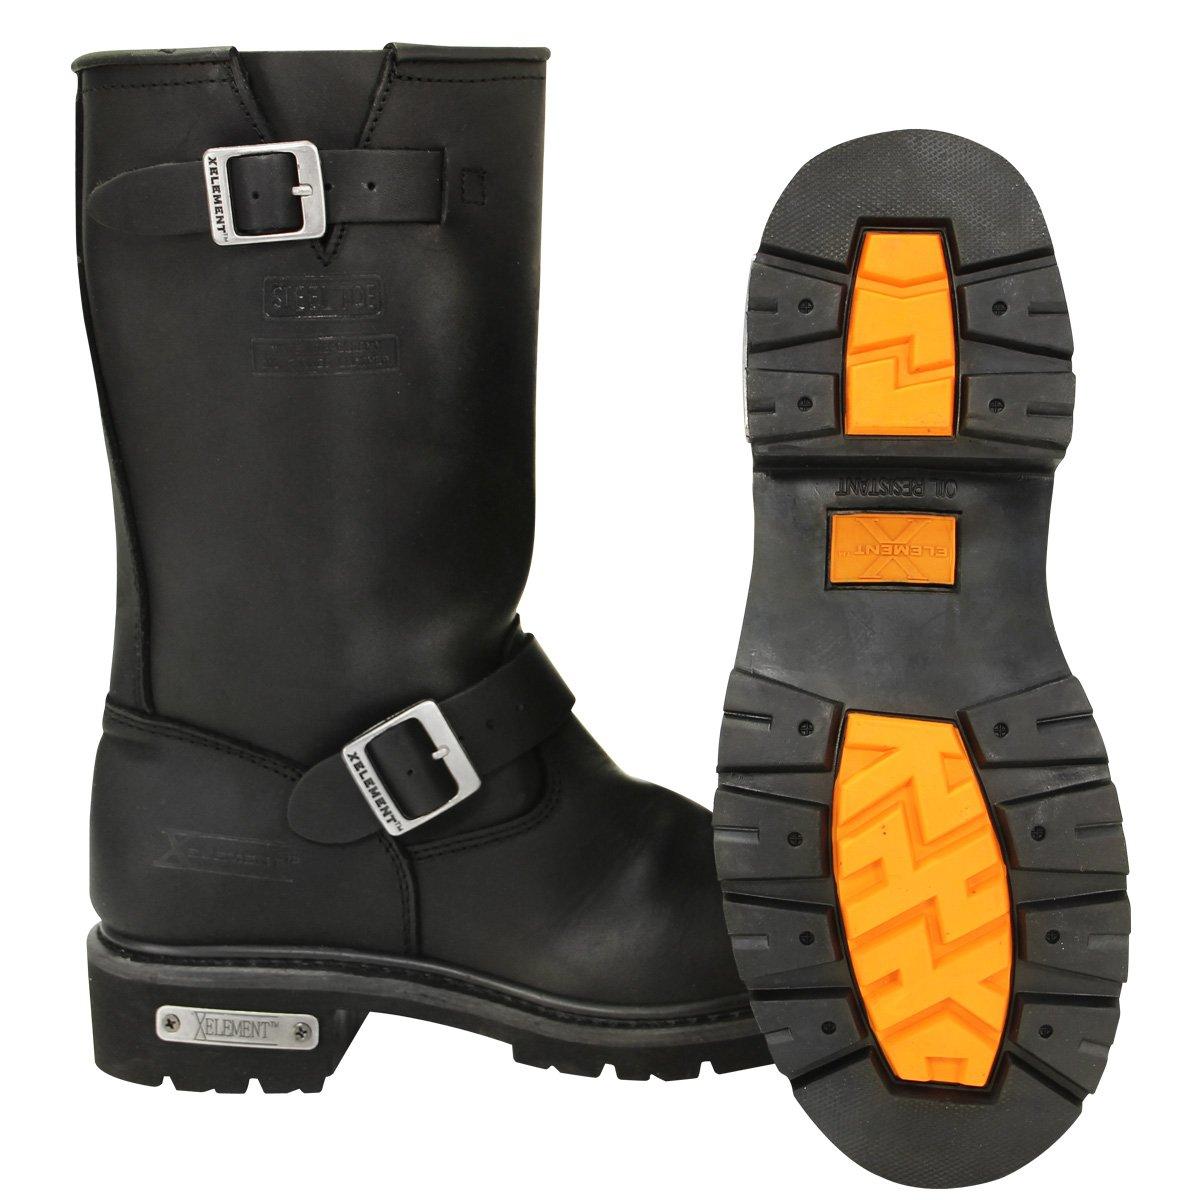 74ff62ea5bc Amazon.com: Xelement 1445 Mens Black Steel Toe Motorcycle Engineer ...